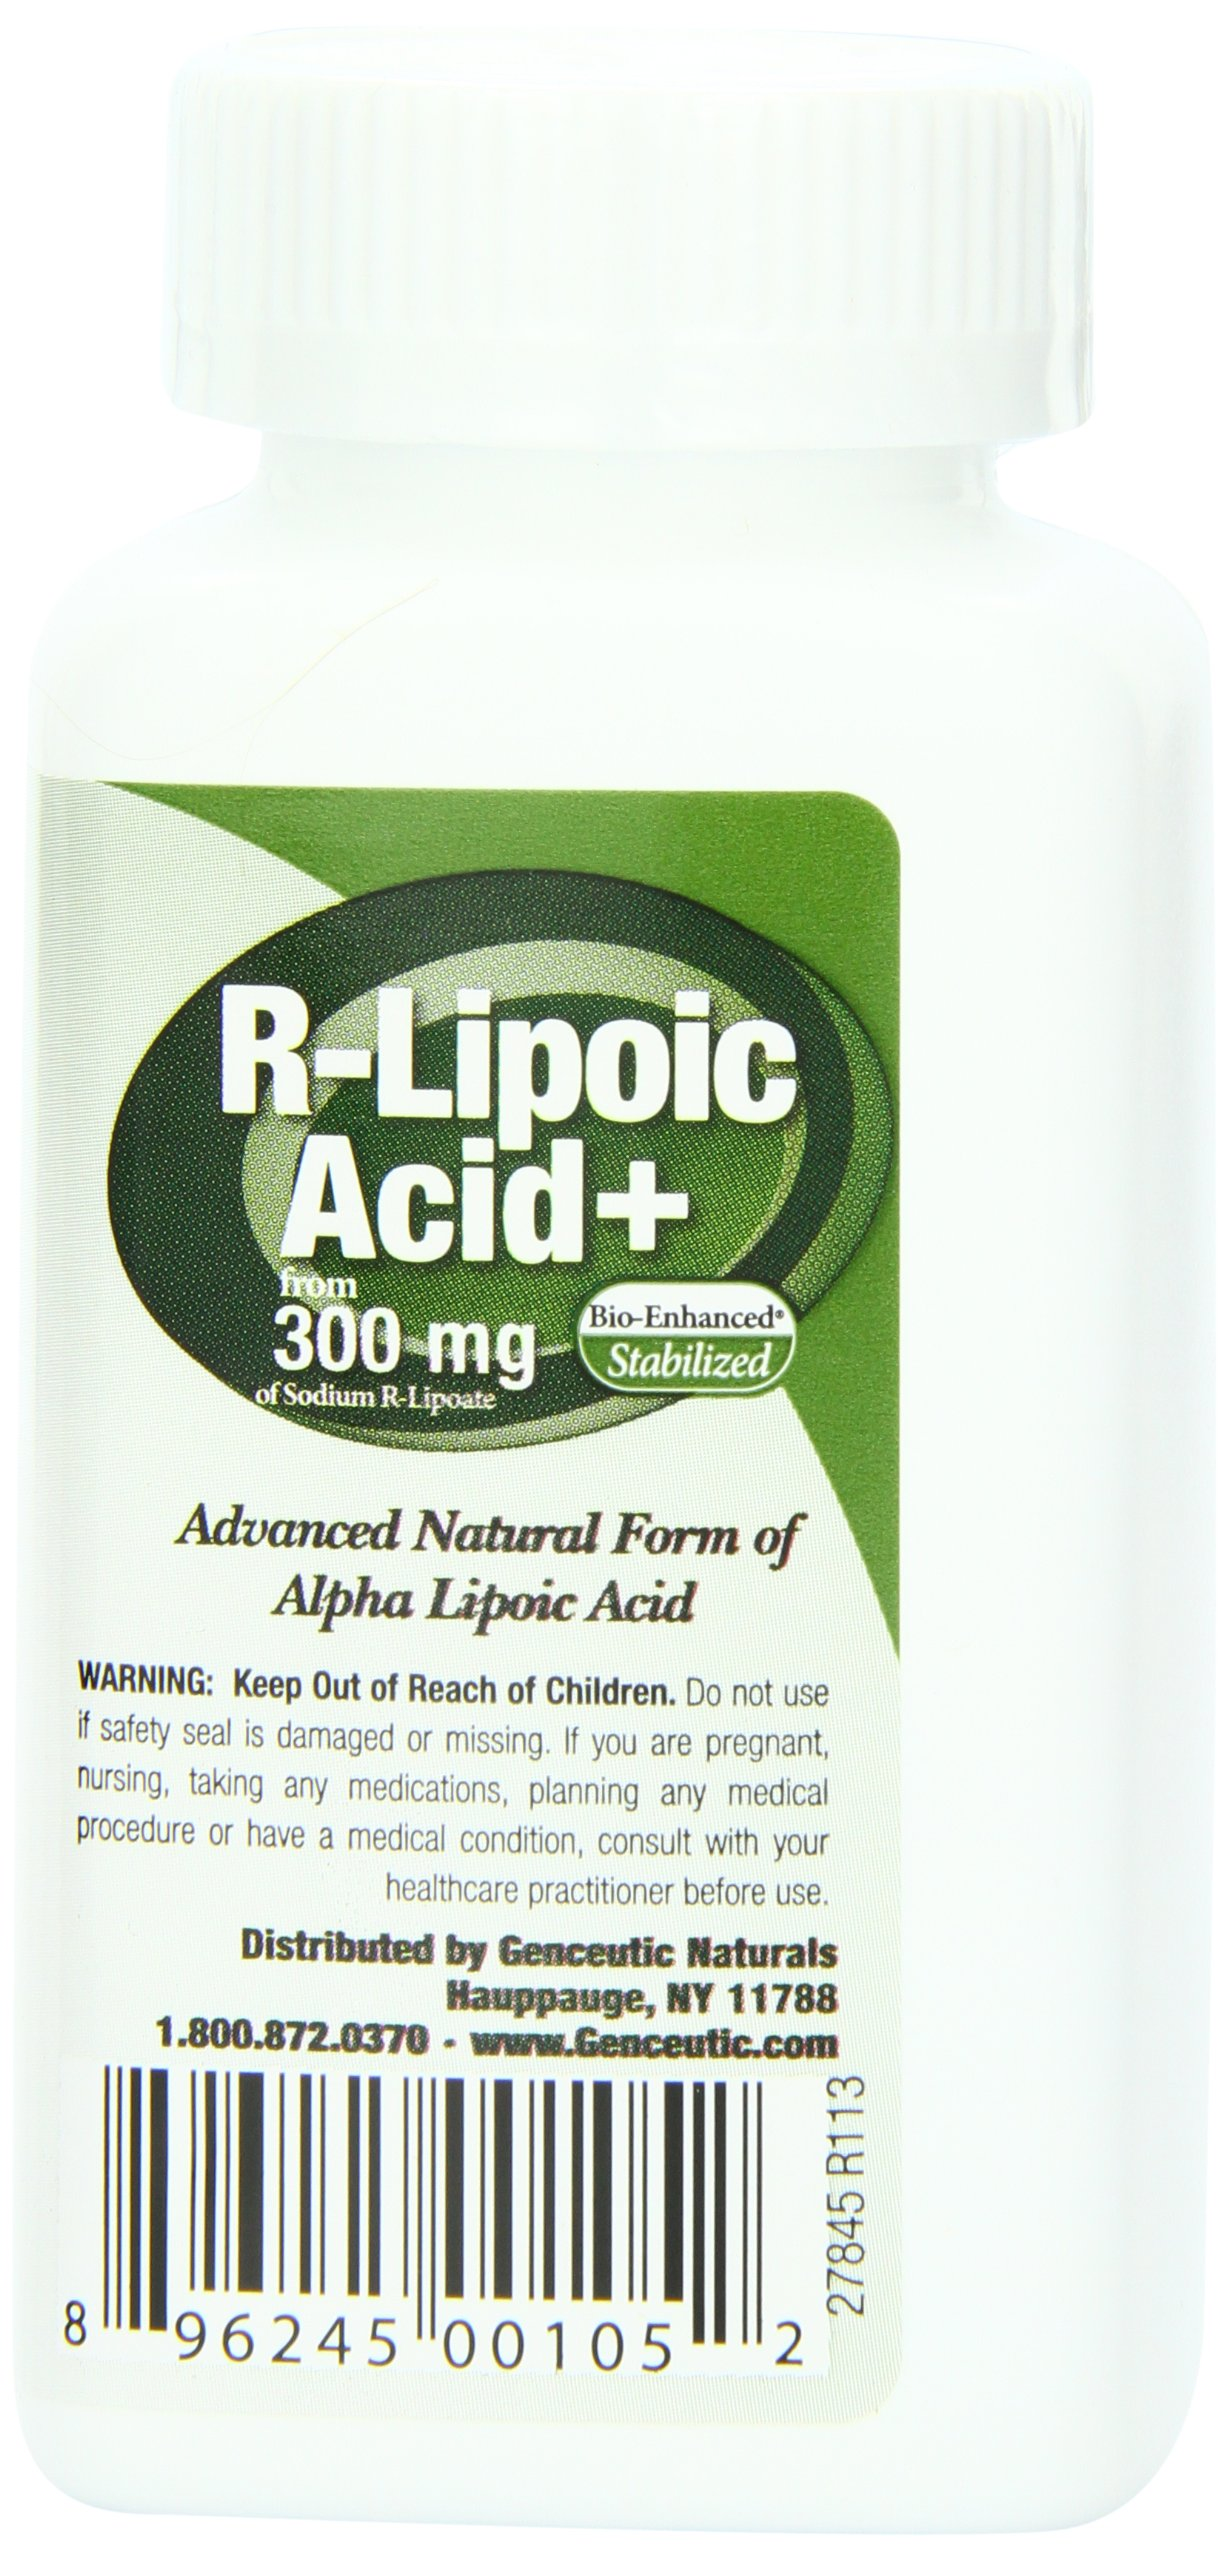 818kFMBY9tL - Genceutic Naturals R-Lipoic Acid 300 Mg, 60-Count